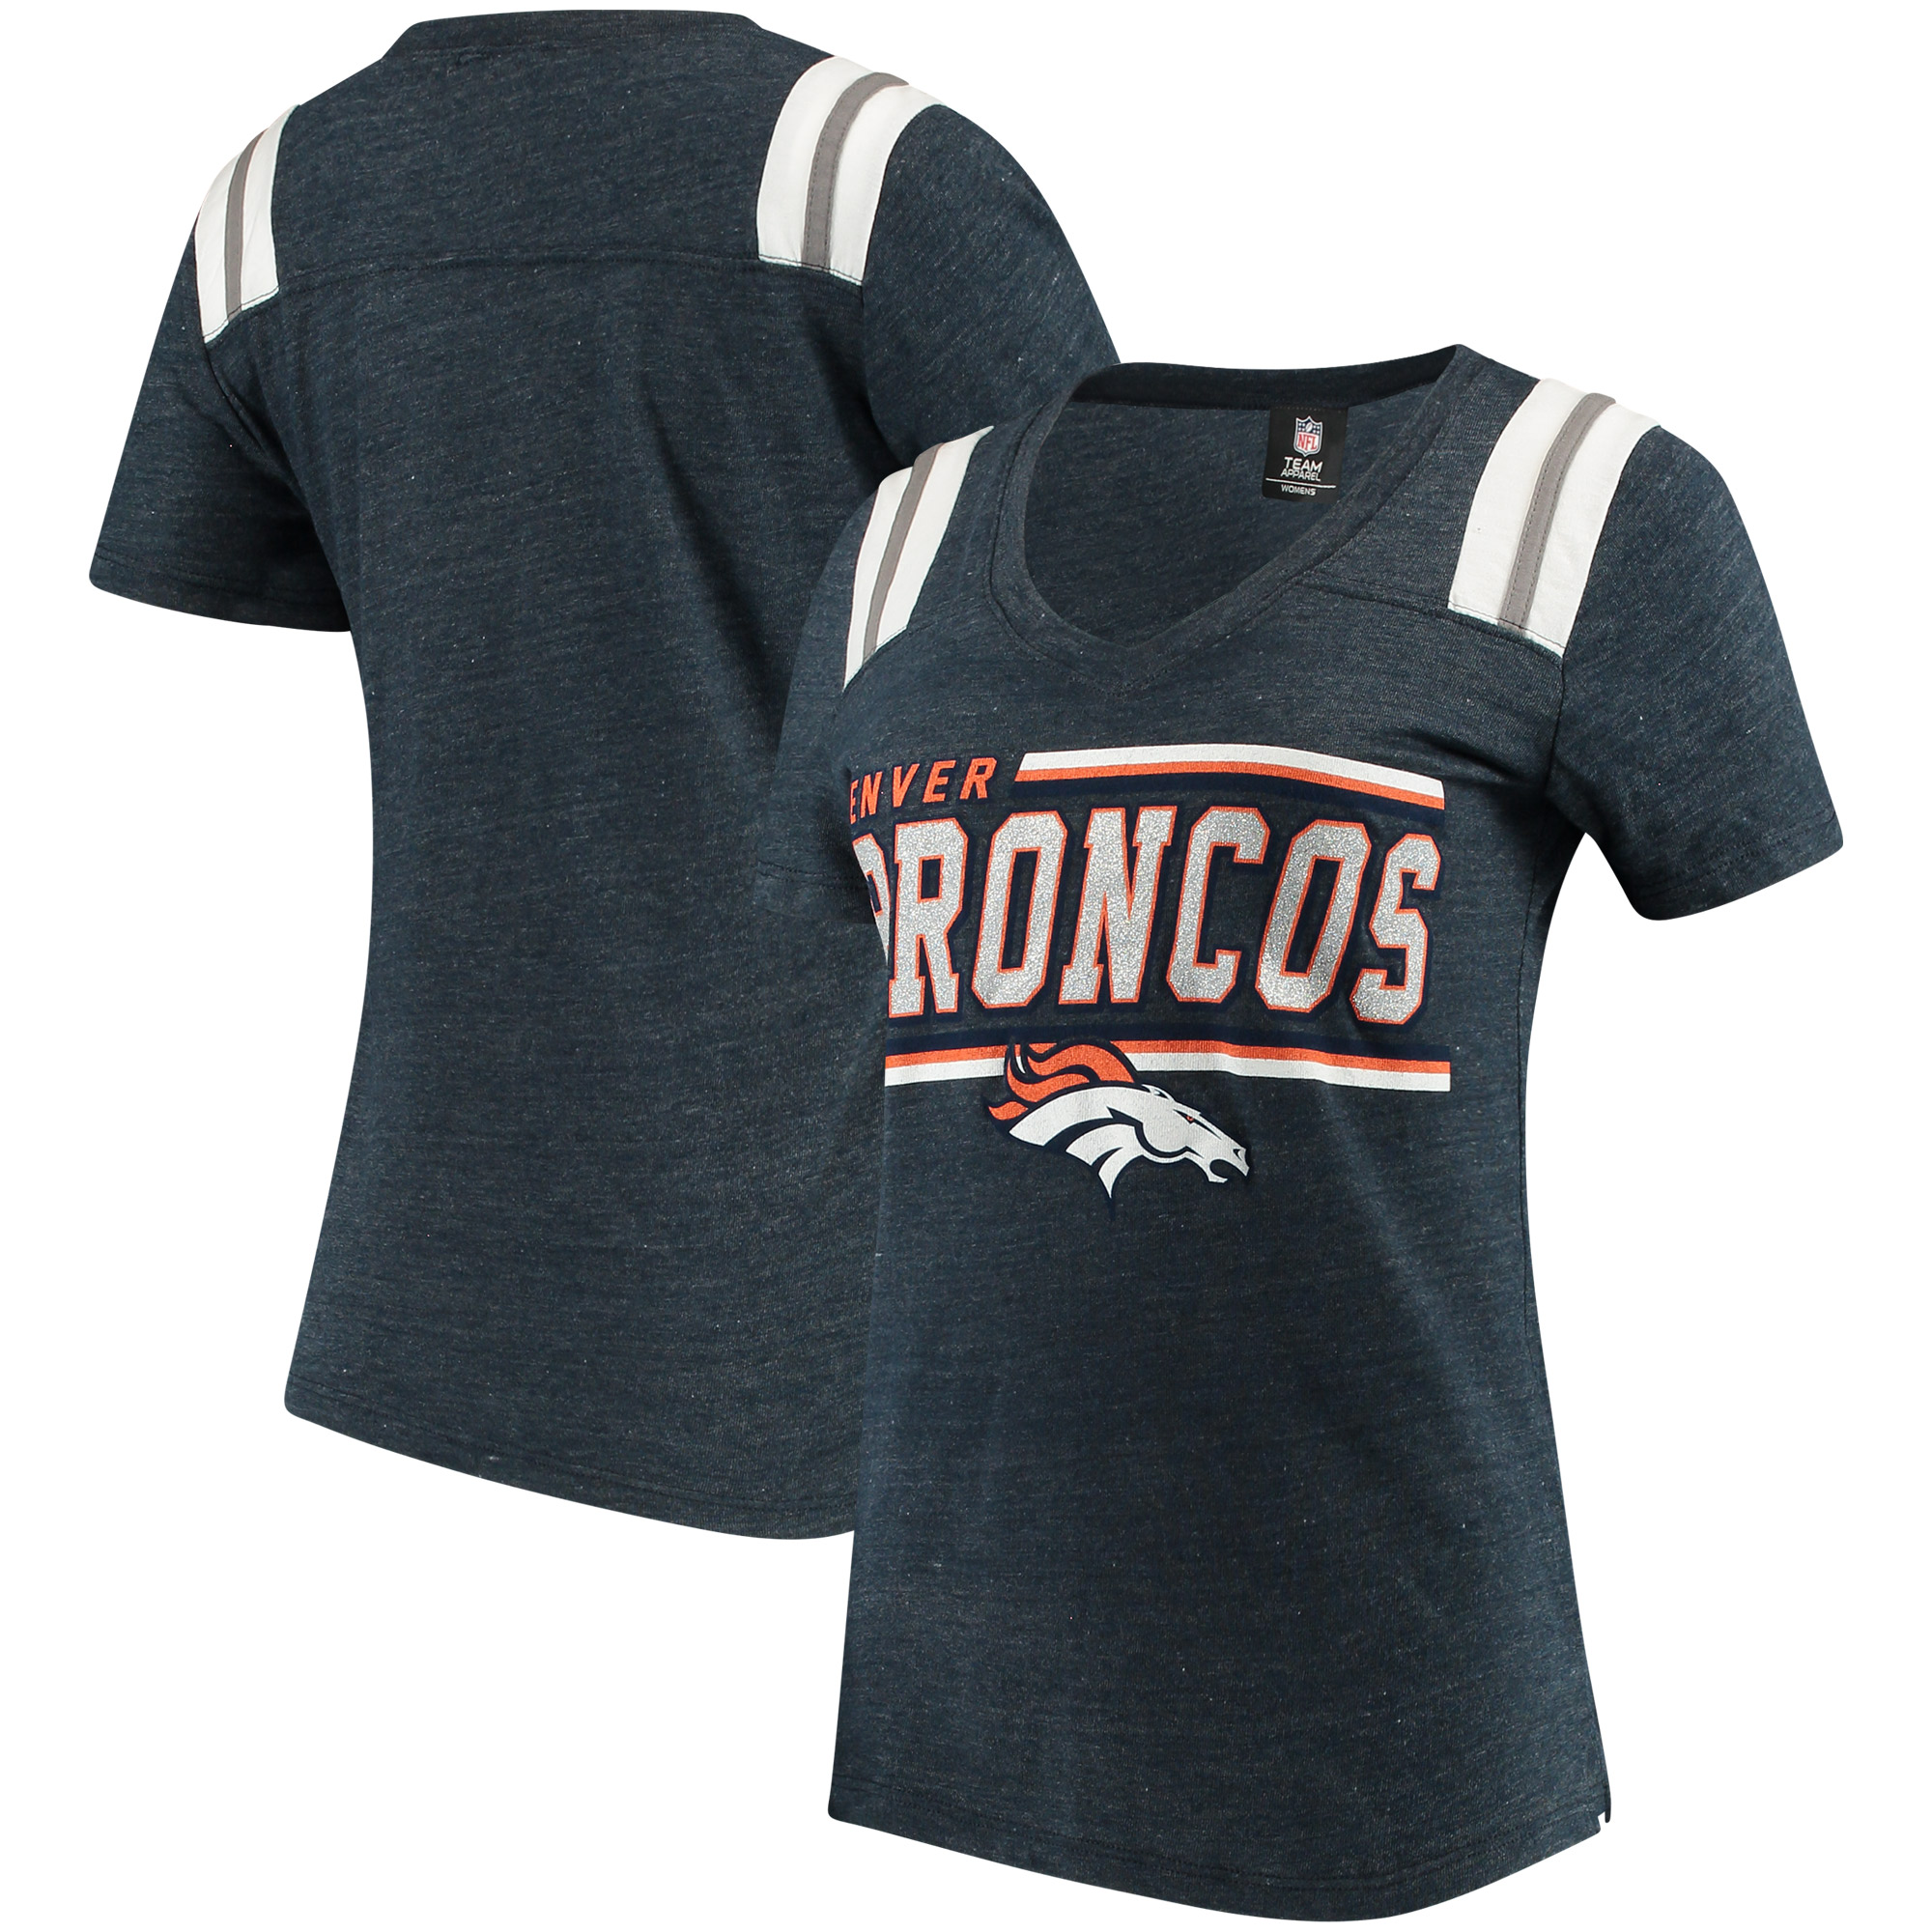 Denver Broncos 5th & Ocean by New Era Women's Wordmark Tri-Blend V-Neck T-Shirt - Navy